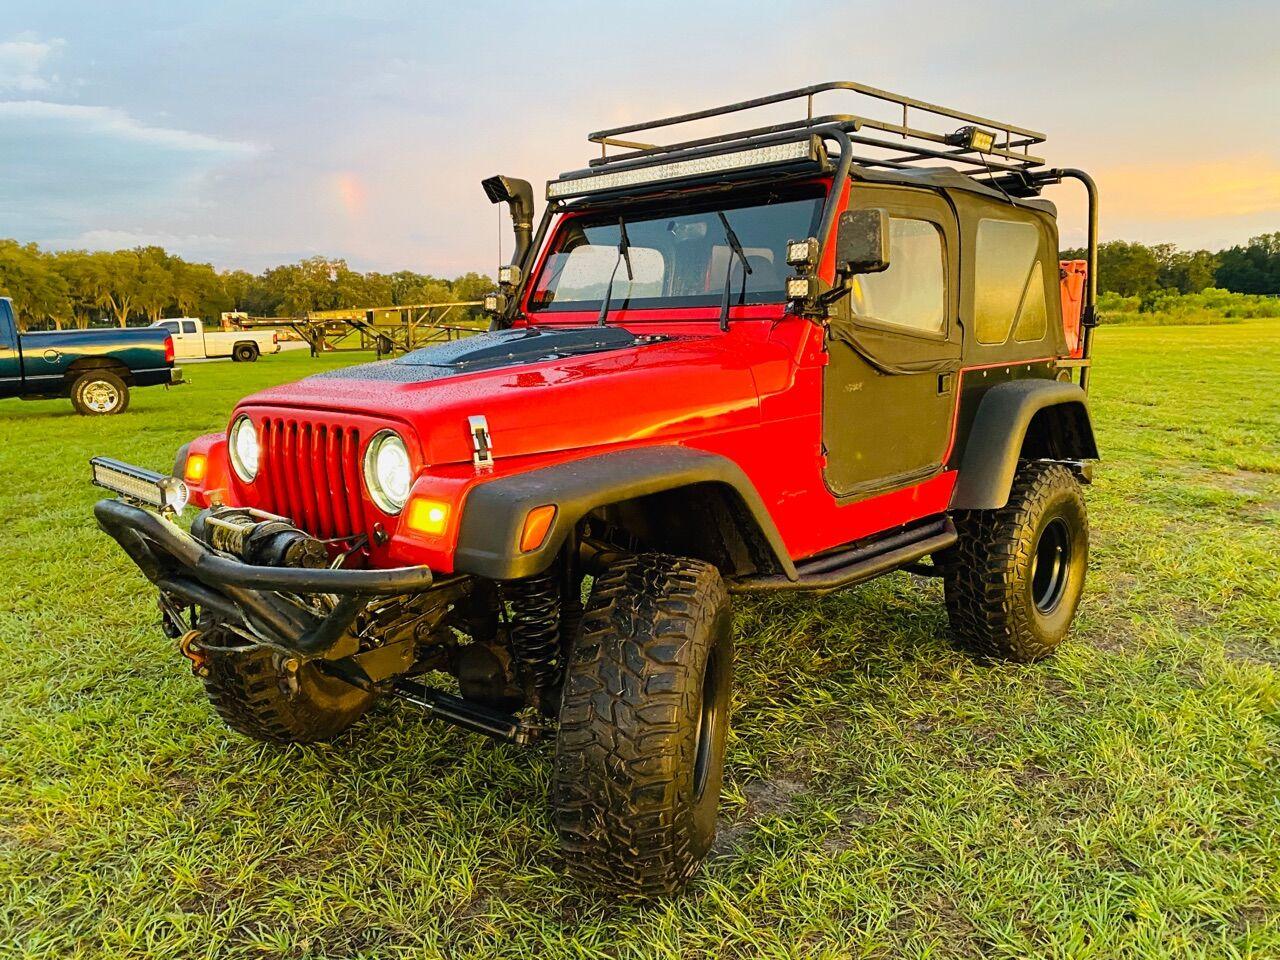 Used 1999 Jeep Wrangler For Sale Carsforsale Com